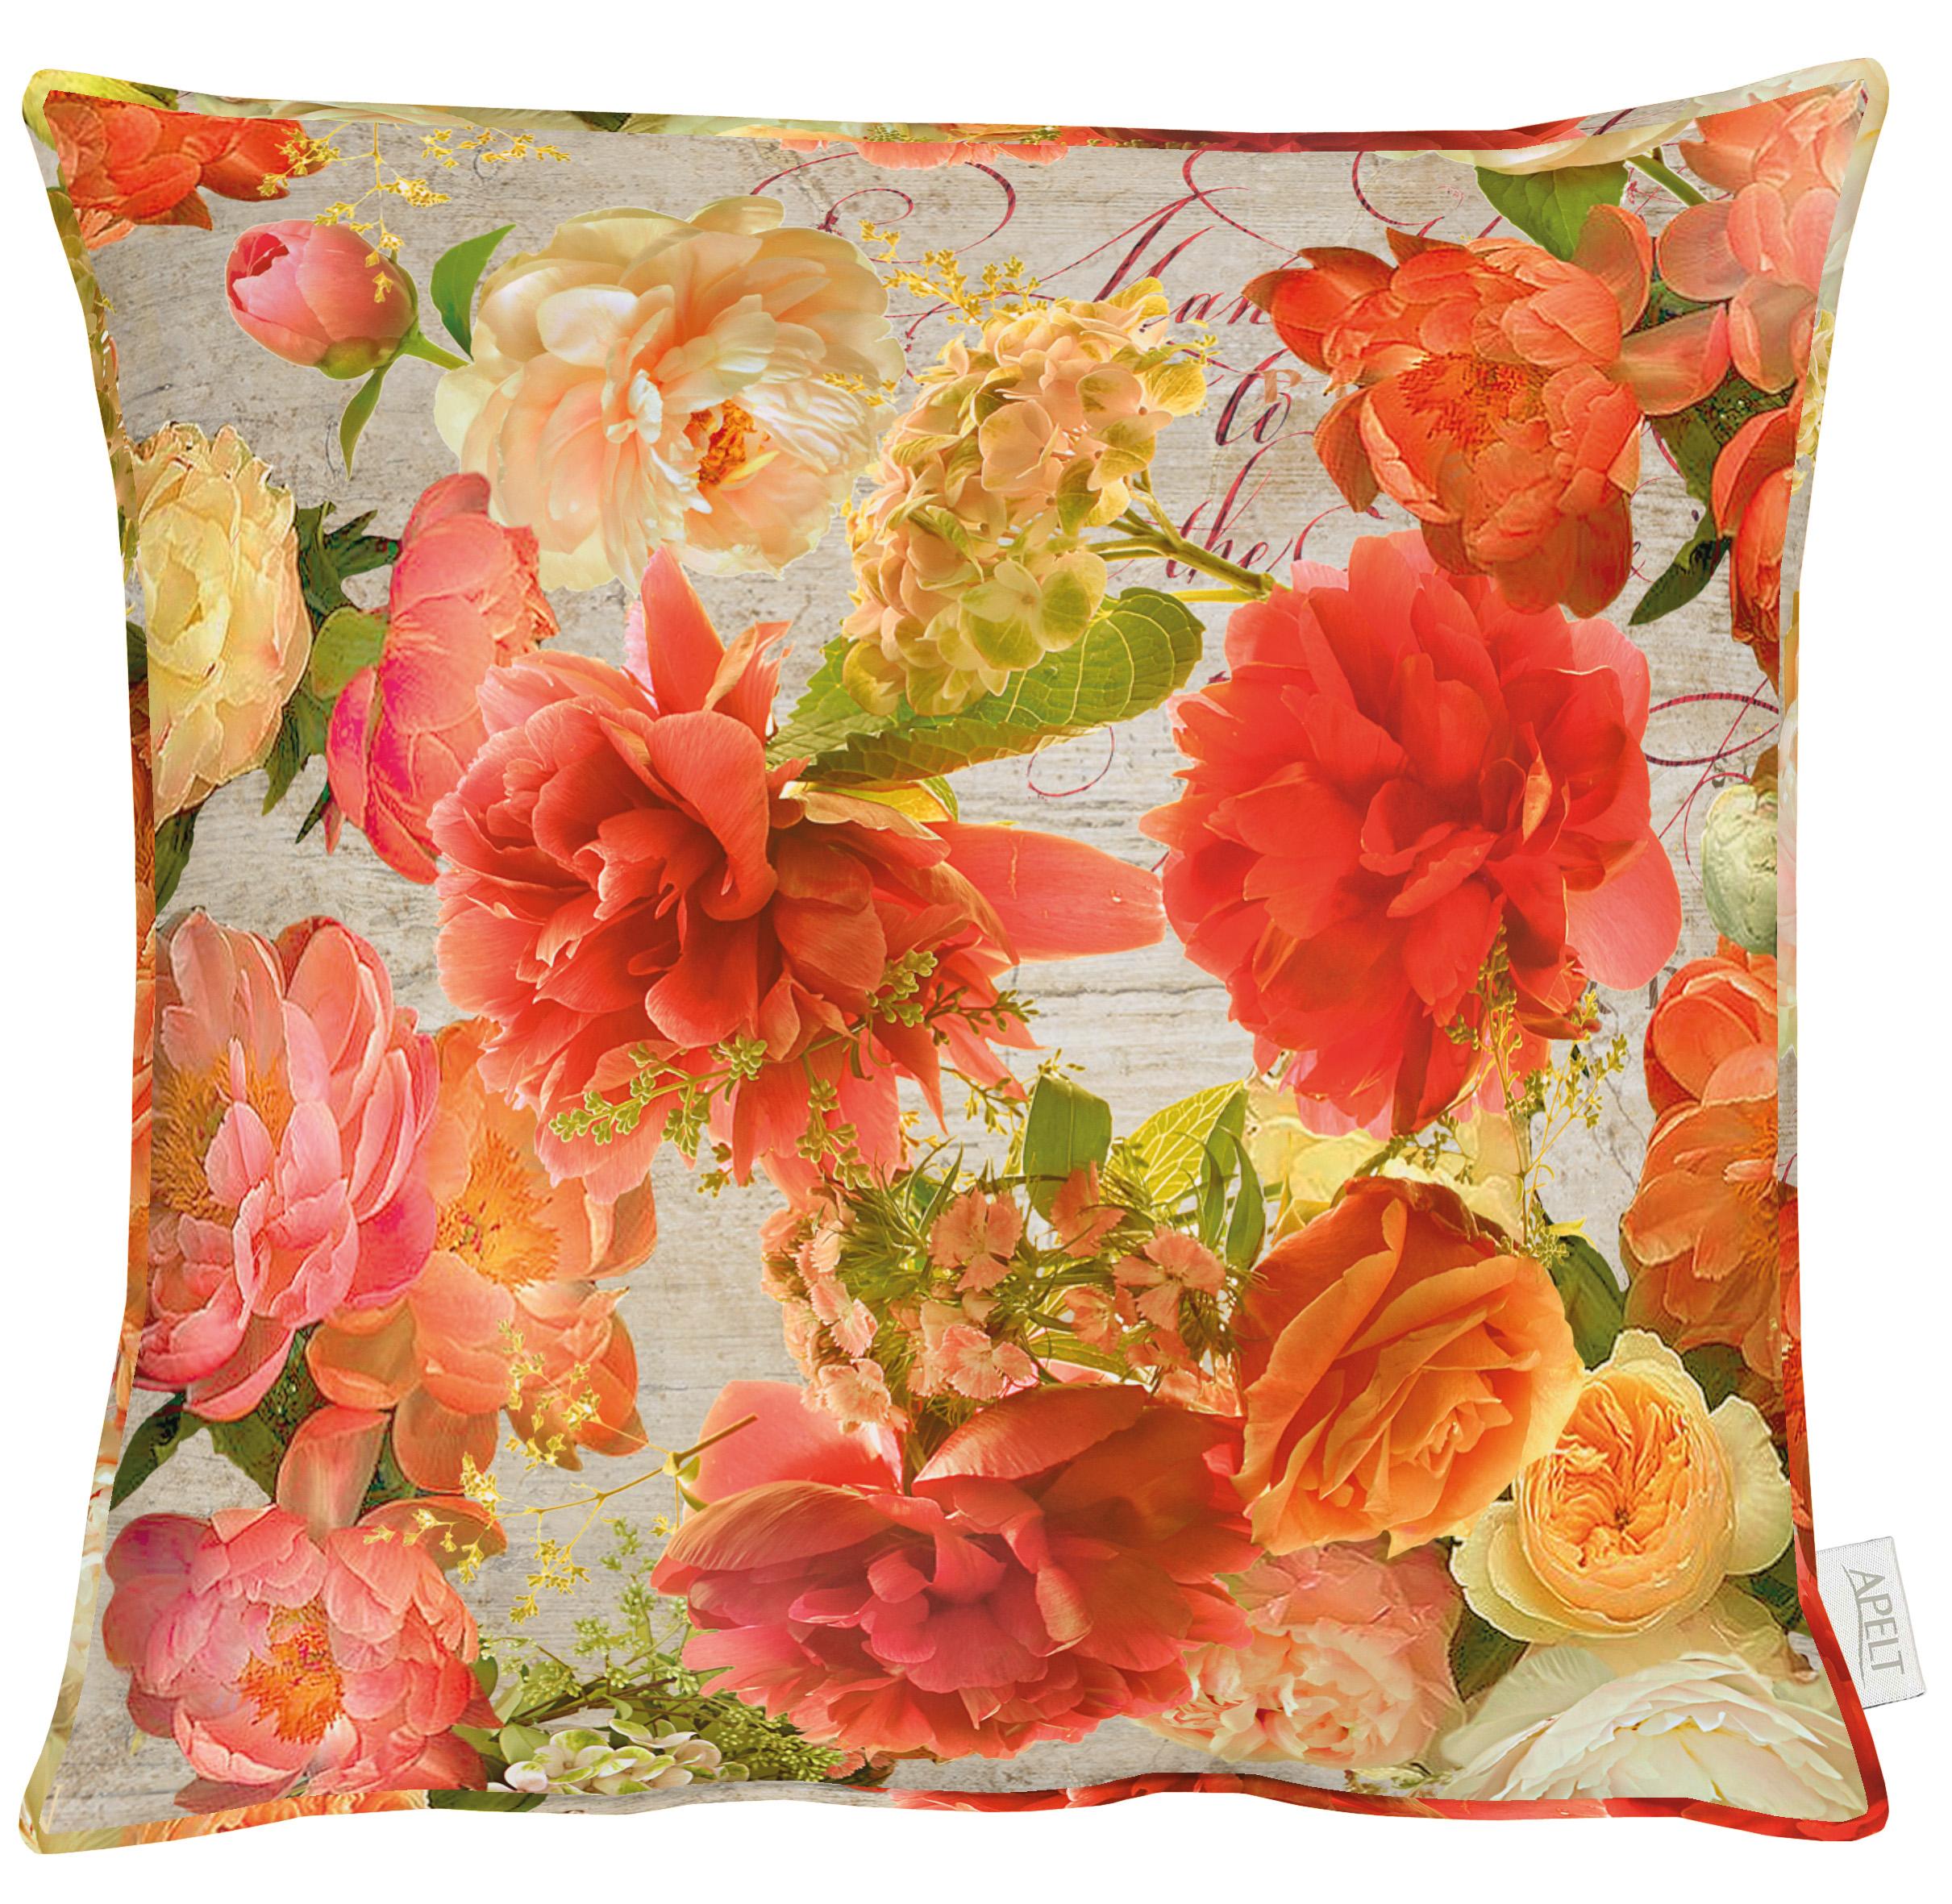 Jardin Orange Cushion 49x49cm